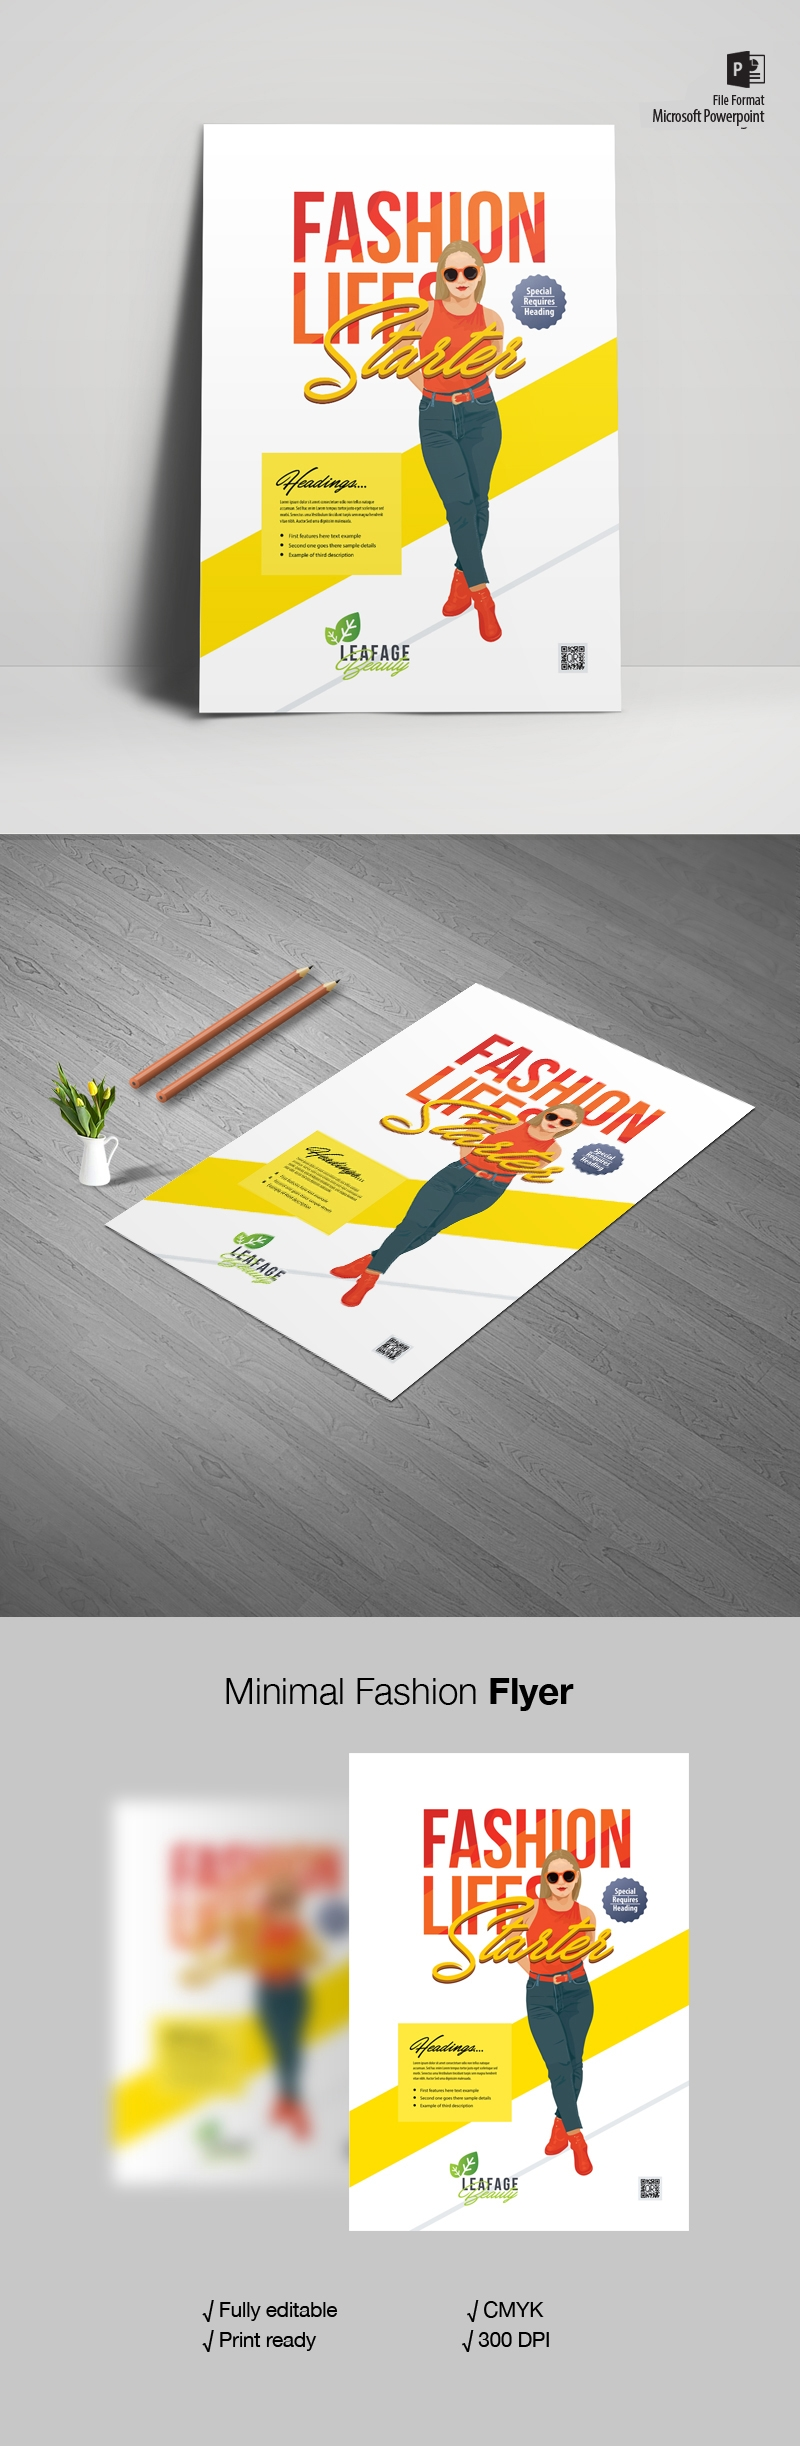 Minimal Fashion Flyer & Poster